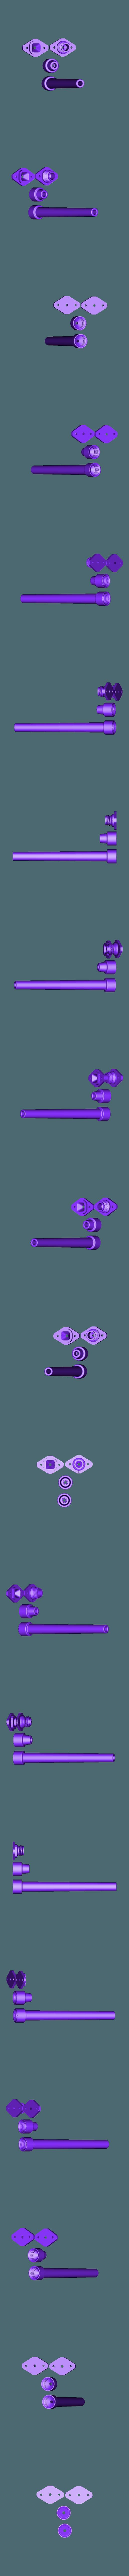 prolongateur_de_passe_fil_2.stl Download free STL file prolongateur de passe fil • 3D printer design, Cyborg